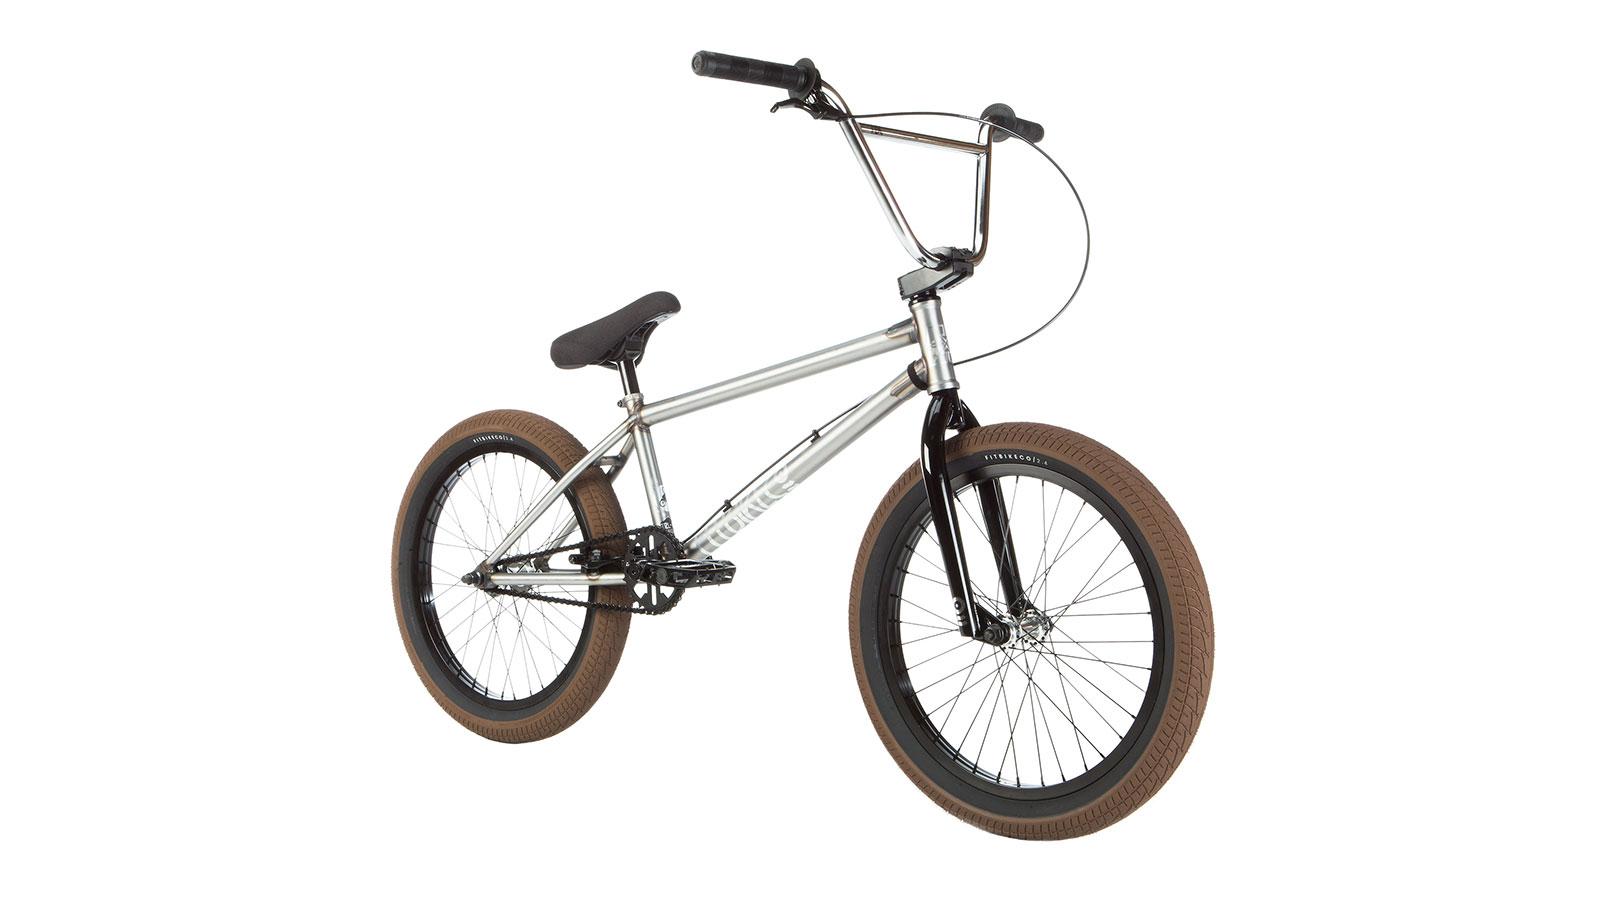 2019 Fit Trl Harti Complete Bike Matte Clear Time 2